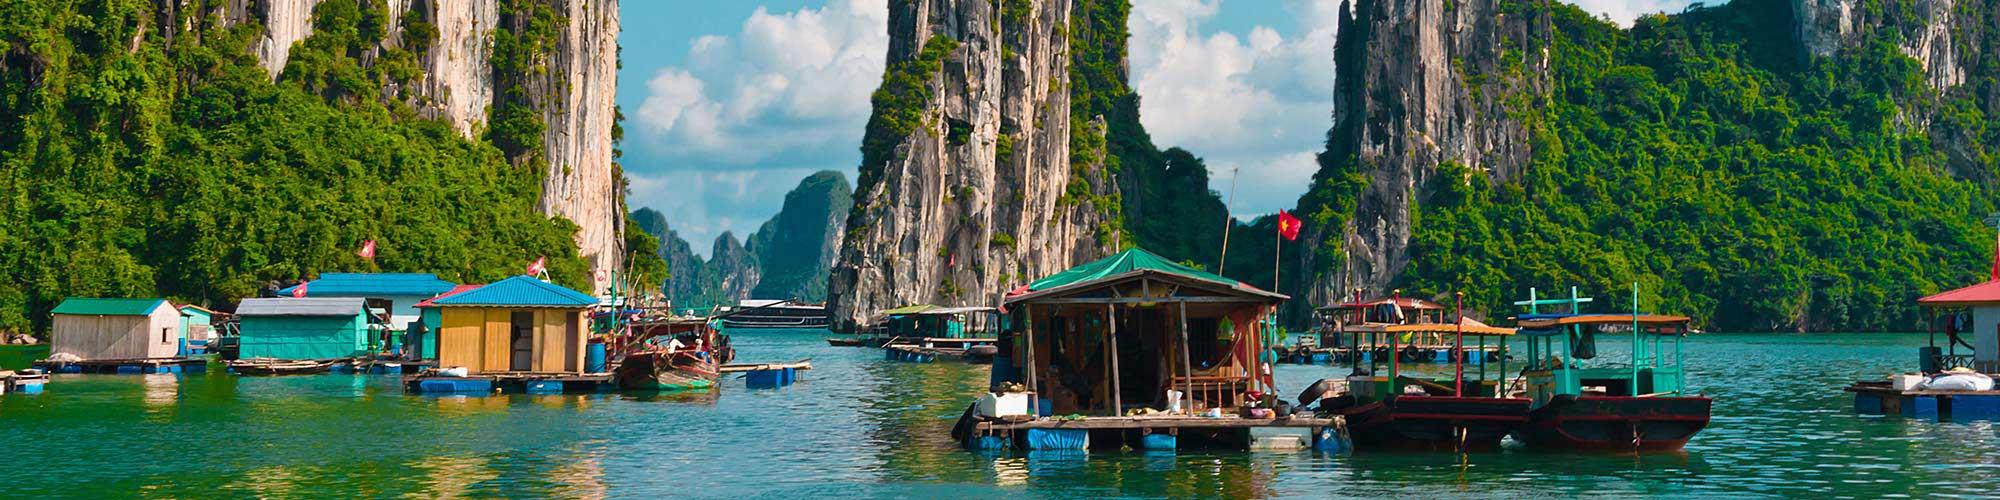 vietnam-banner-1.jpg